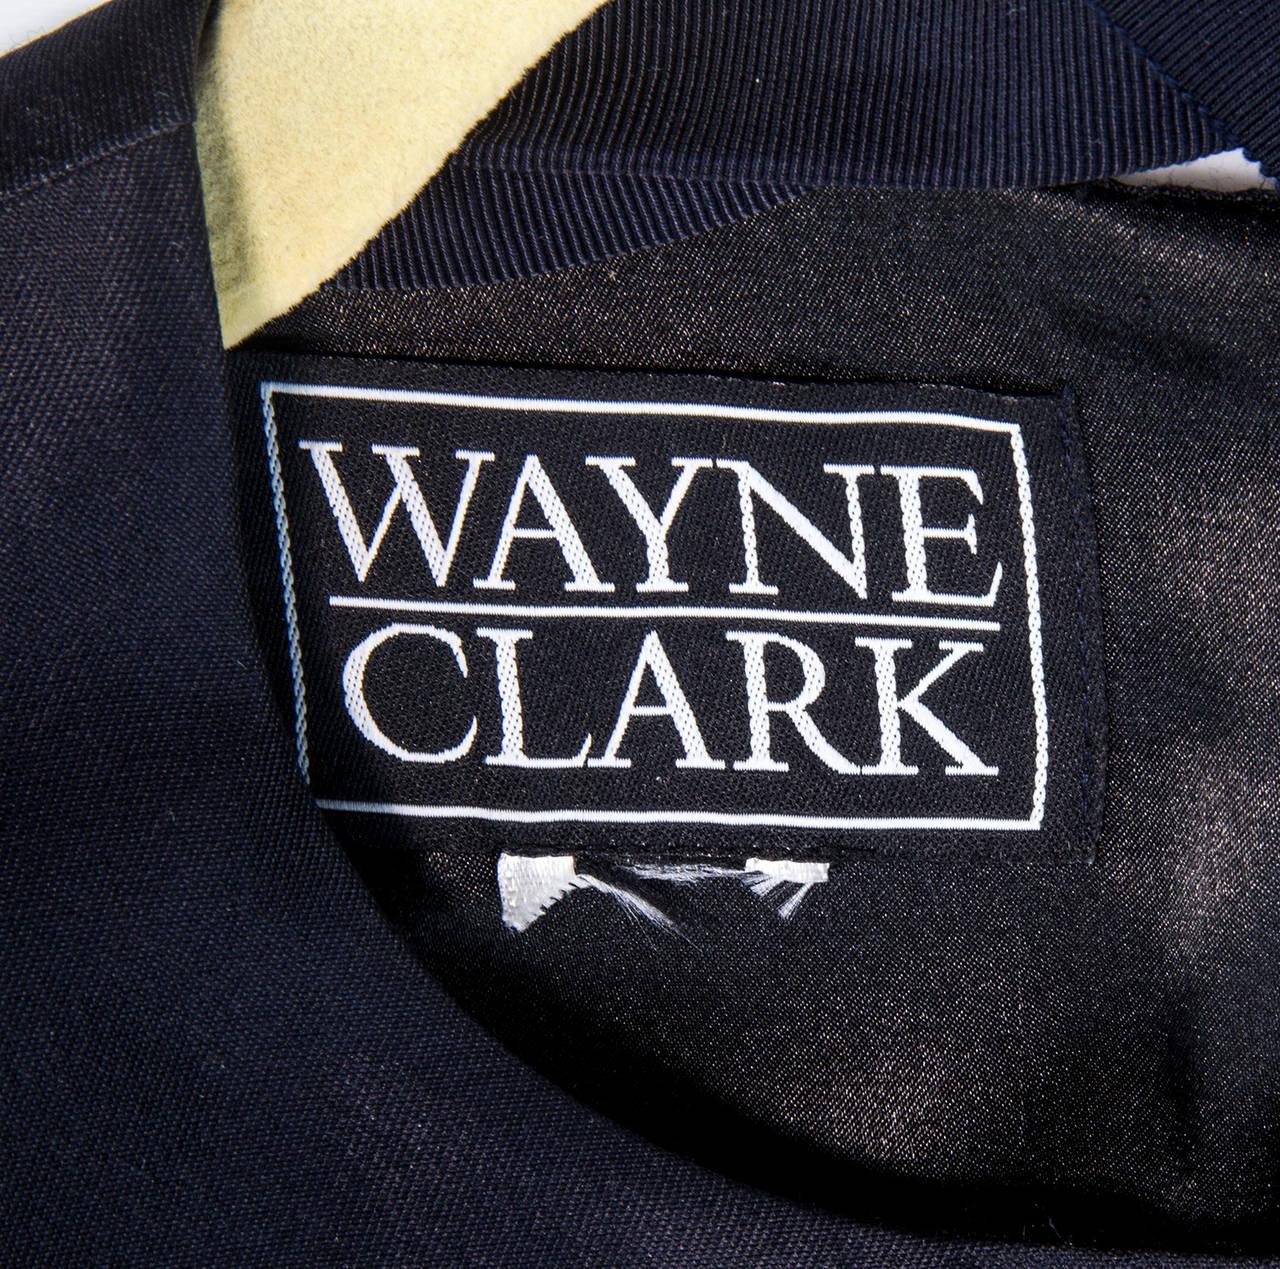 Wayne Clark Black Gold Belted Gown For Sale 4